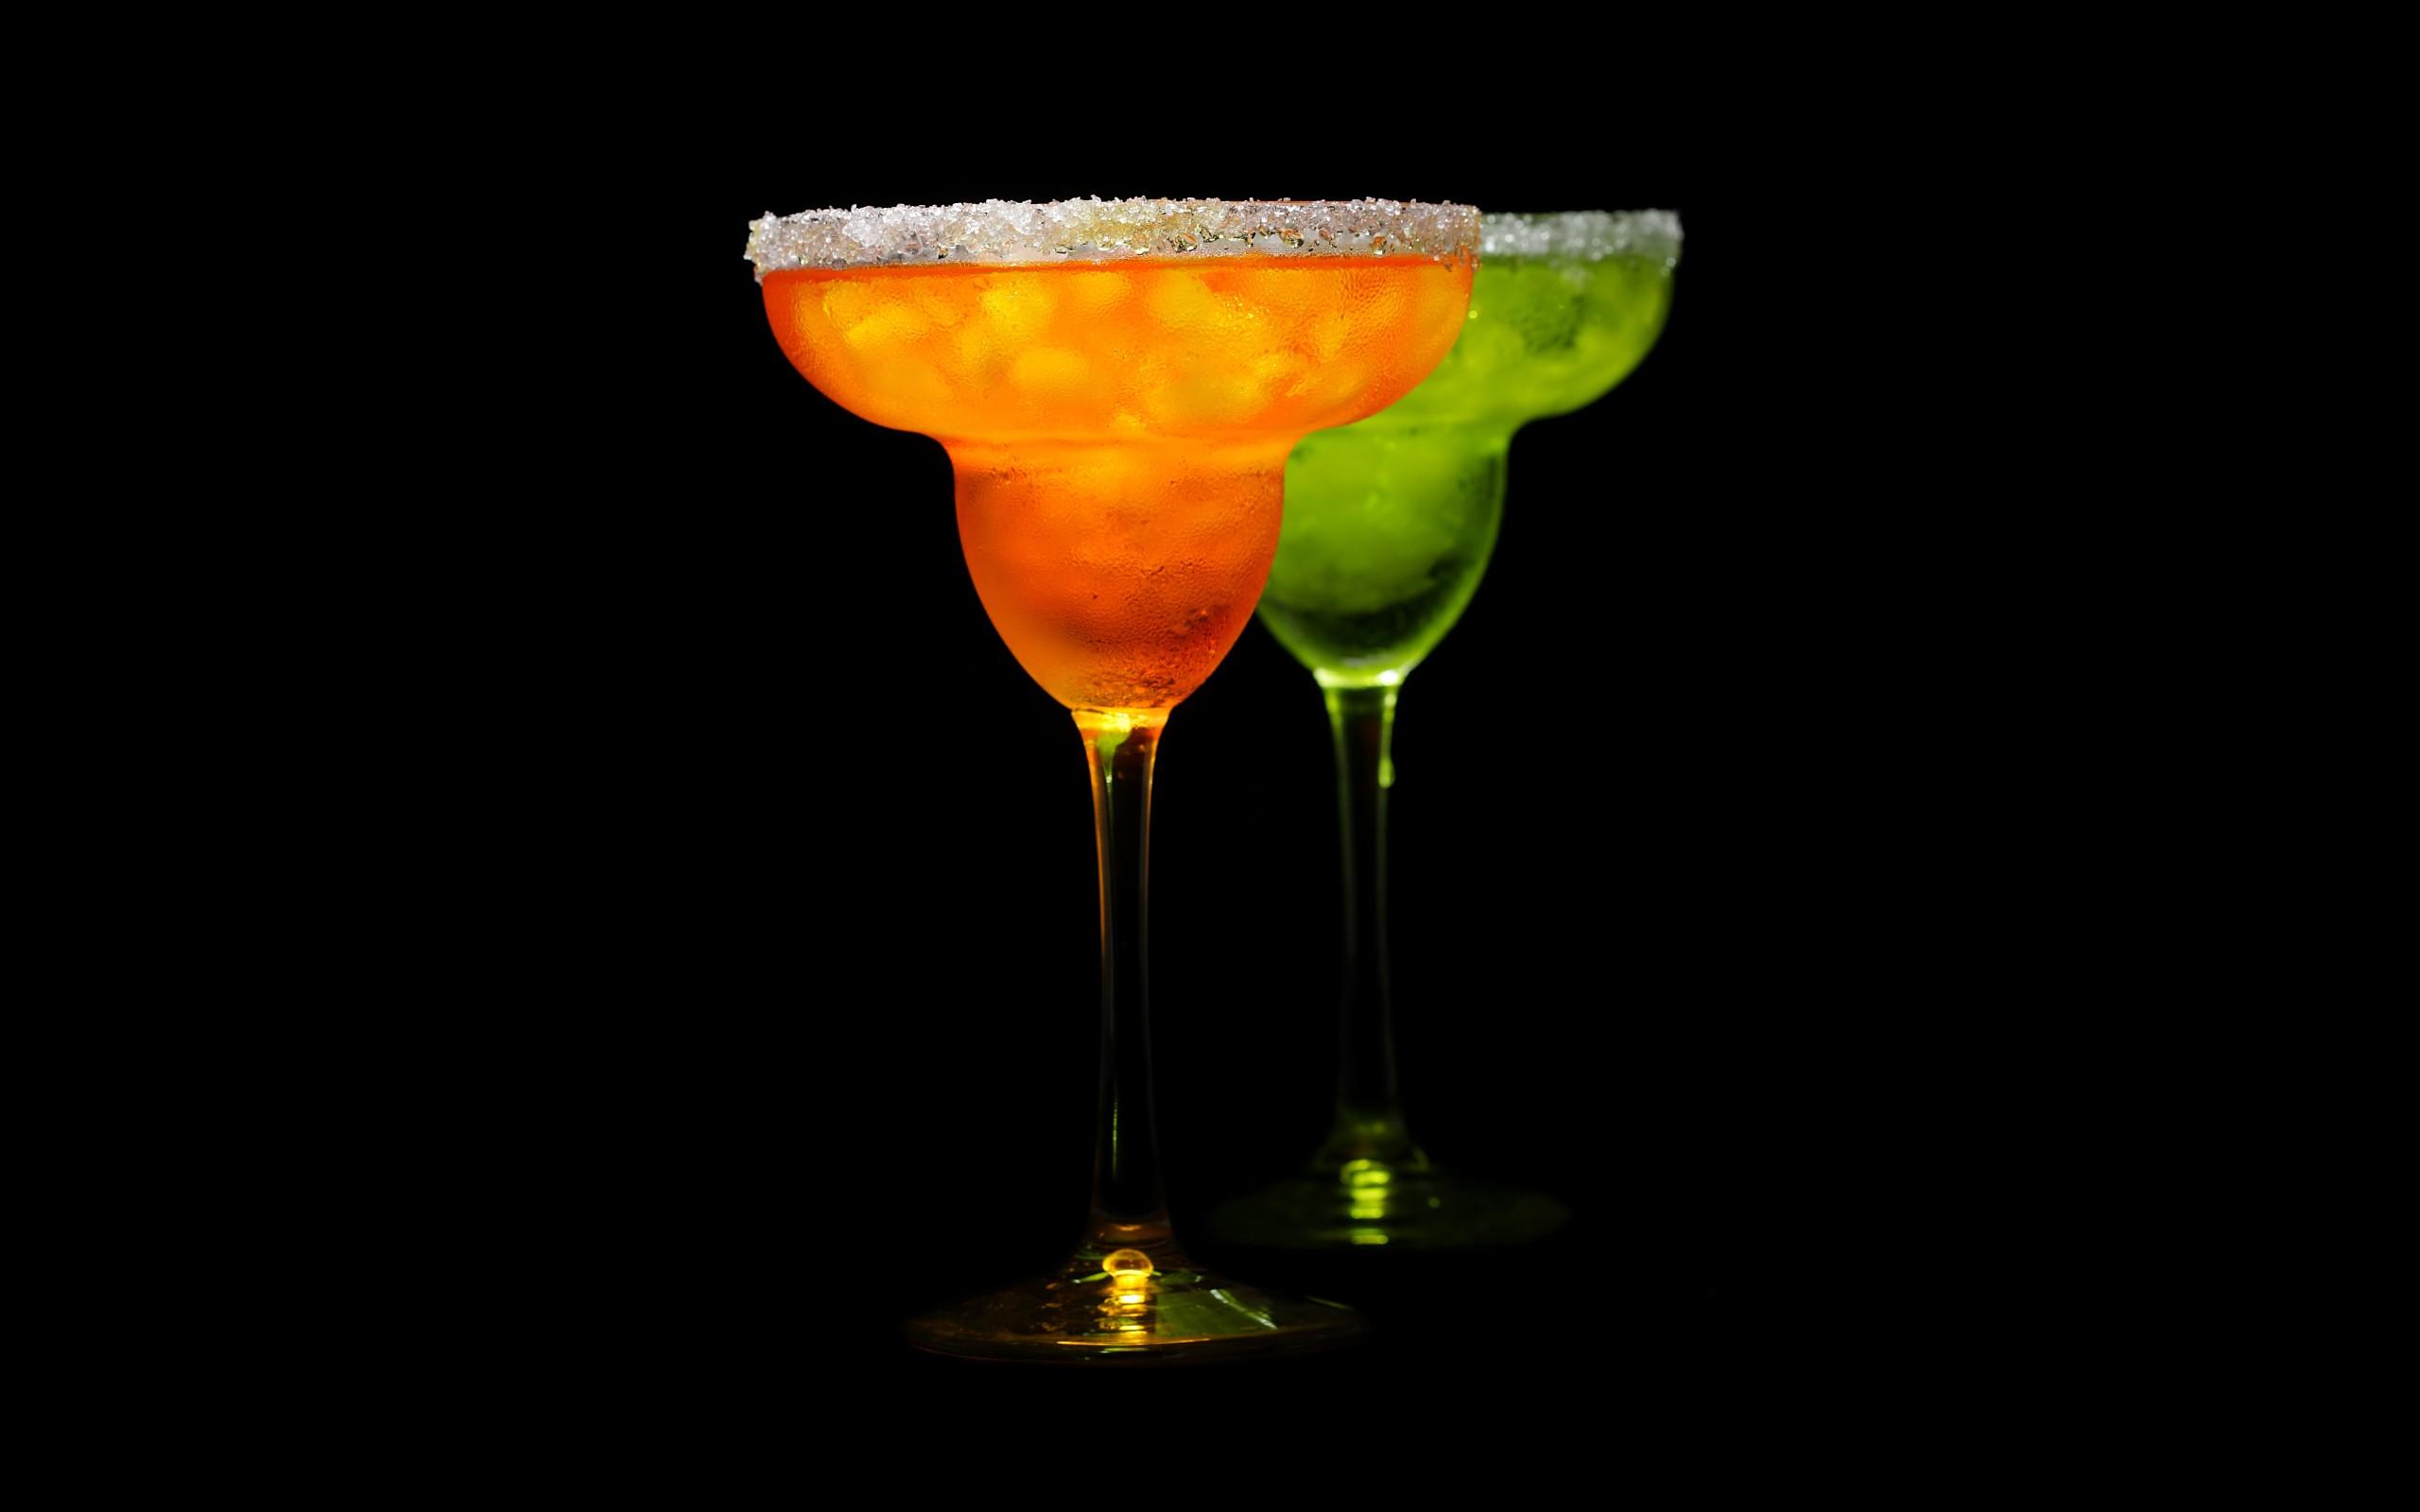 Cosmopolitan cocktail wallpaper  Wallpaper : drink, drinking glass, cocktails, Martini, cosmopolitan ...